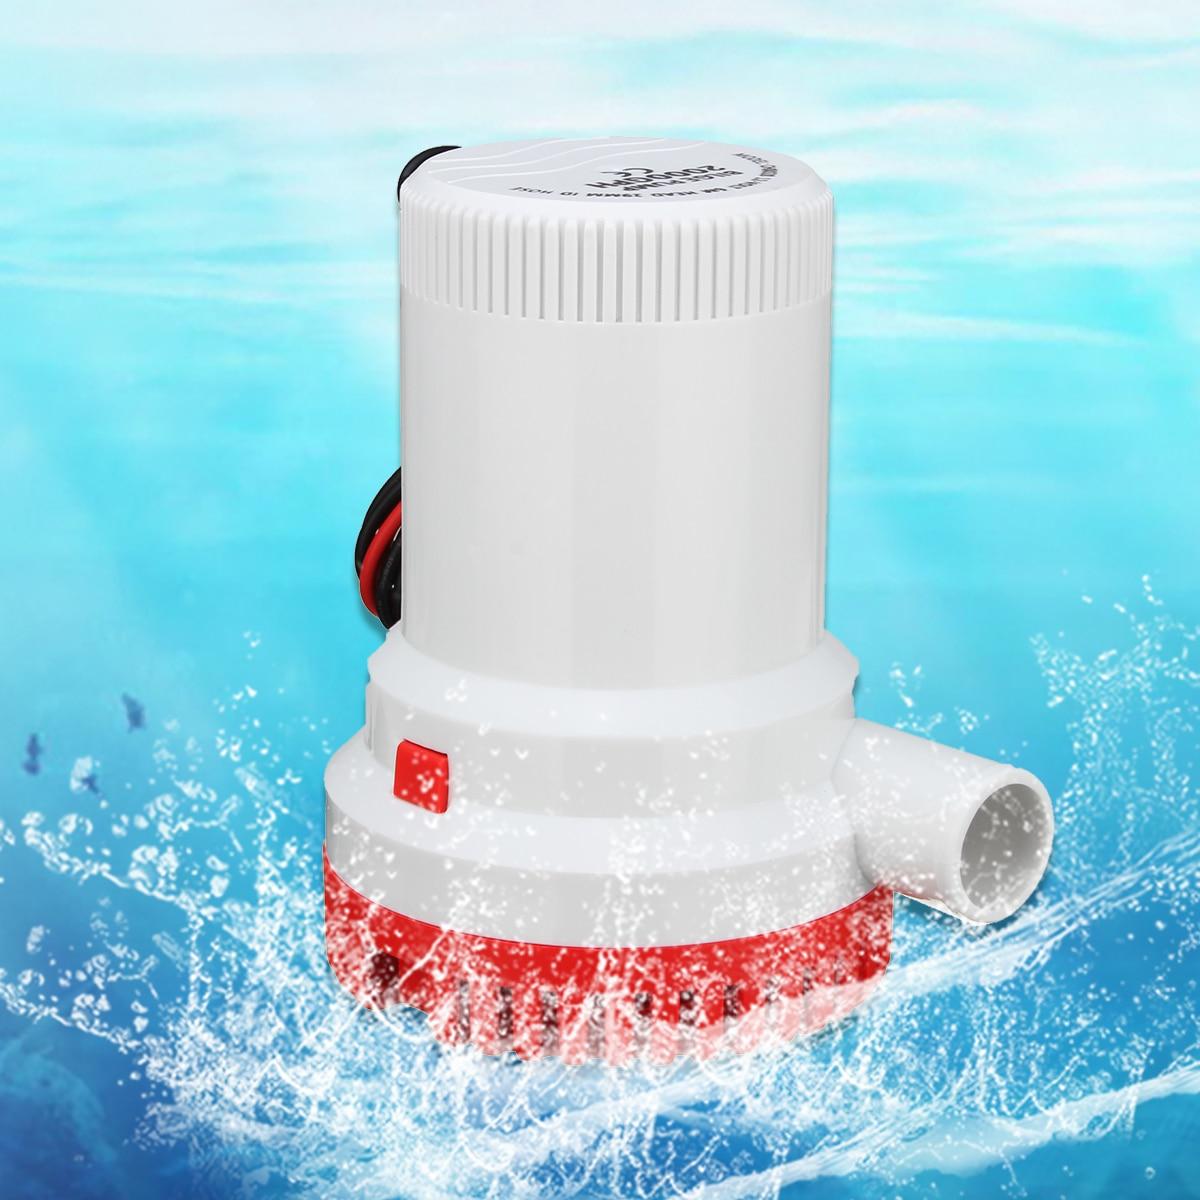 цена на 12V 8A 2000GPH Submersible Marine Boat Bilge Water Pump Fishing Caravan Camping Fully Submersible Electric Moisture Tight Seals